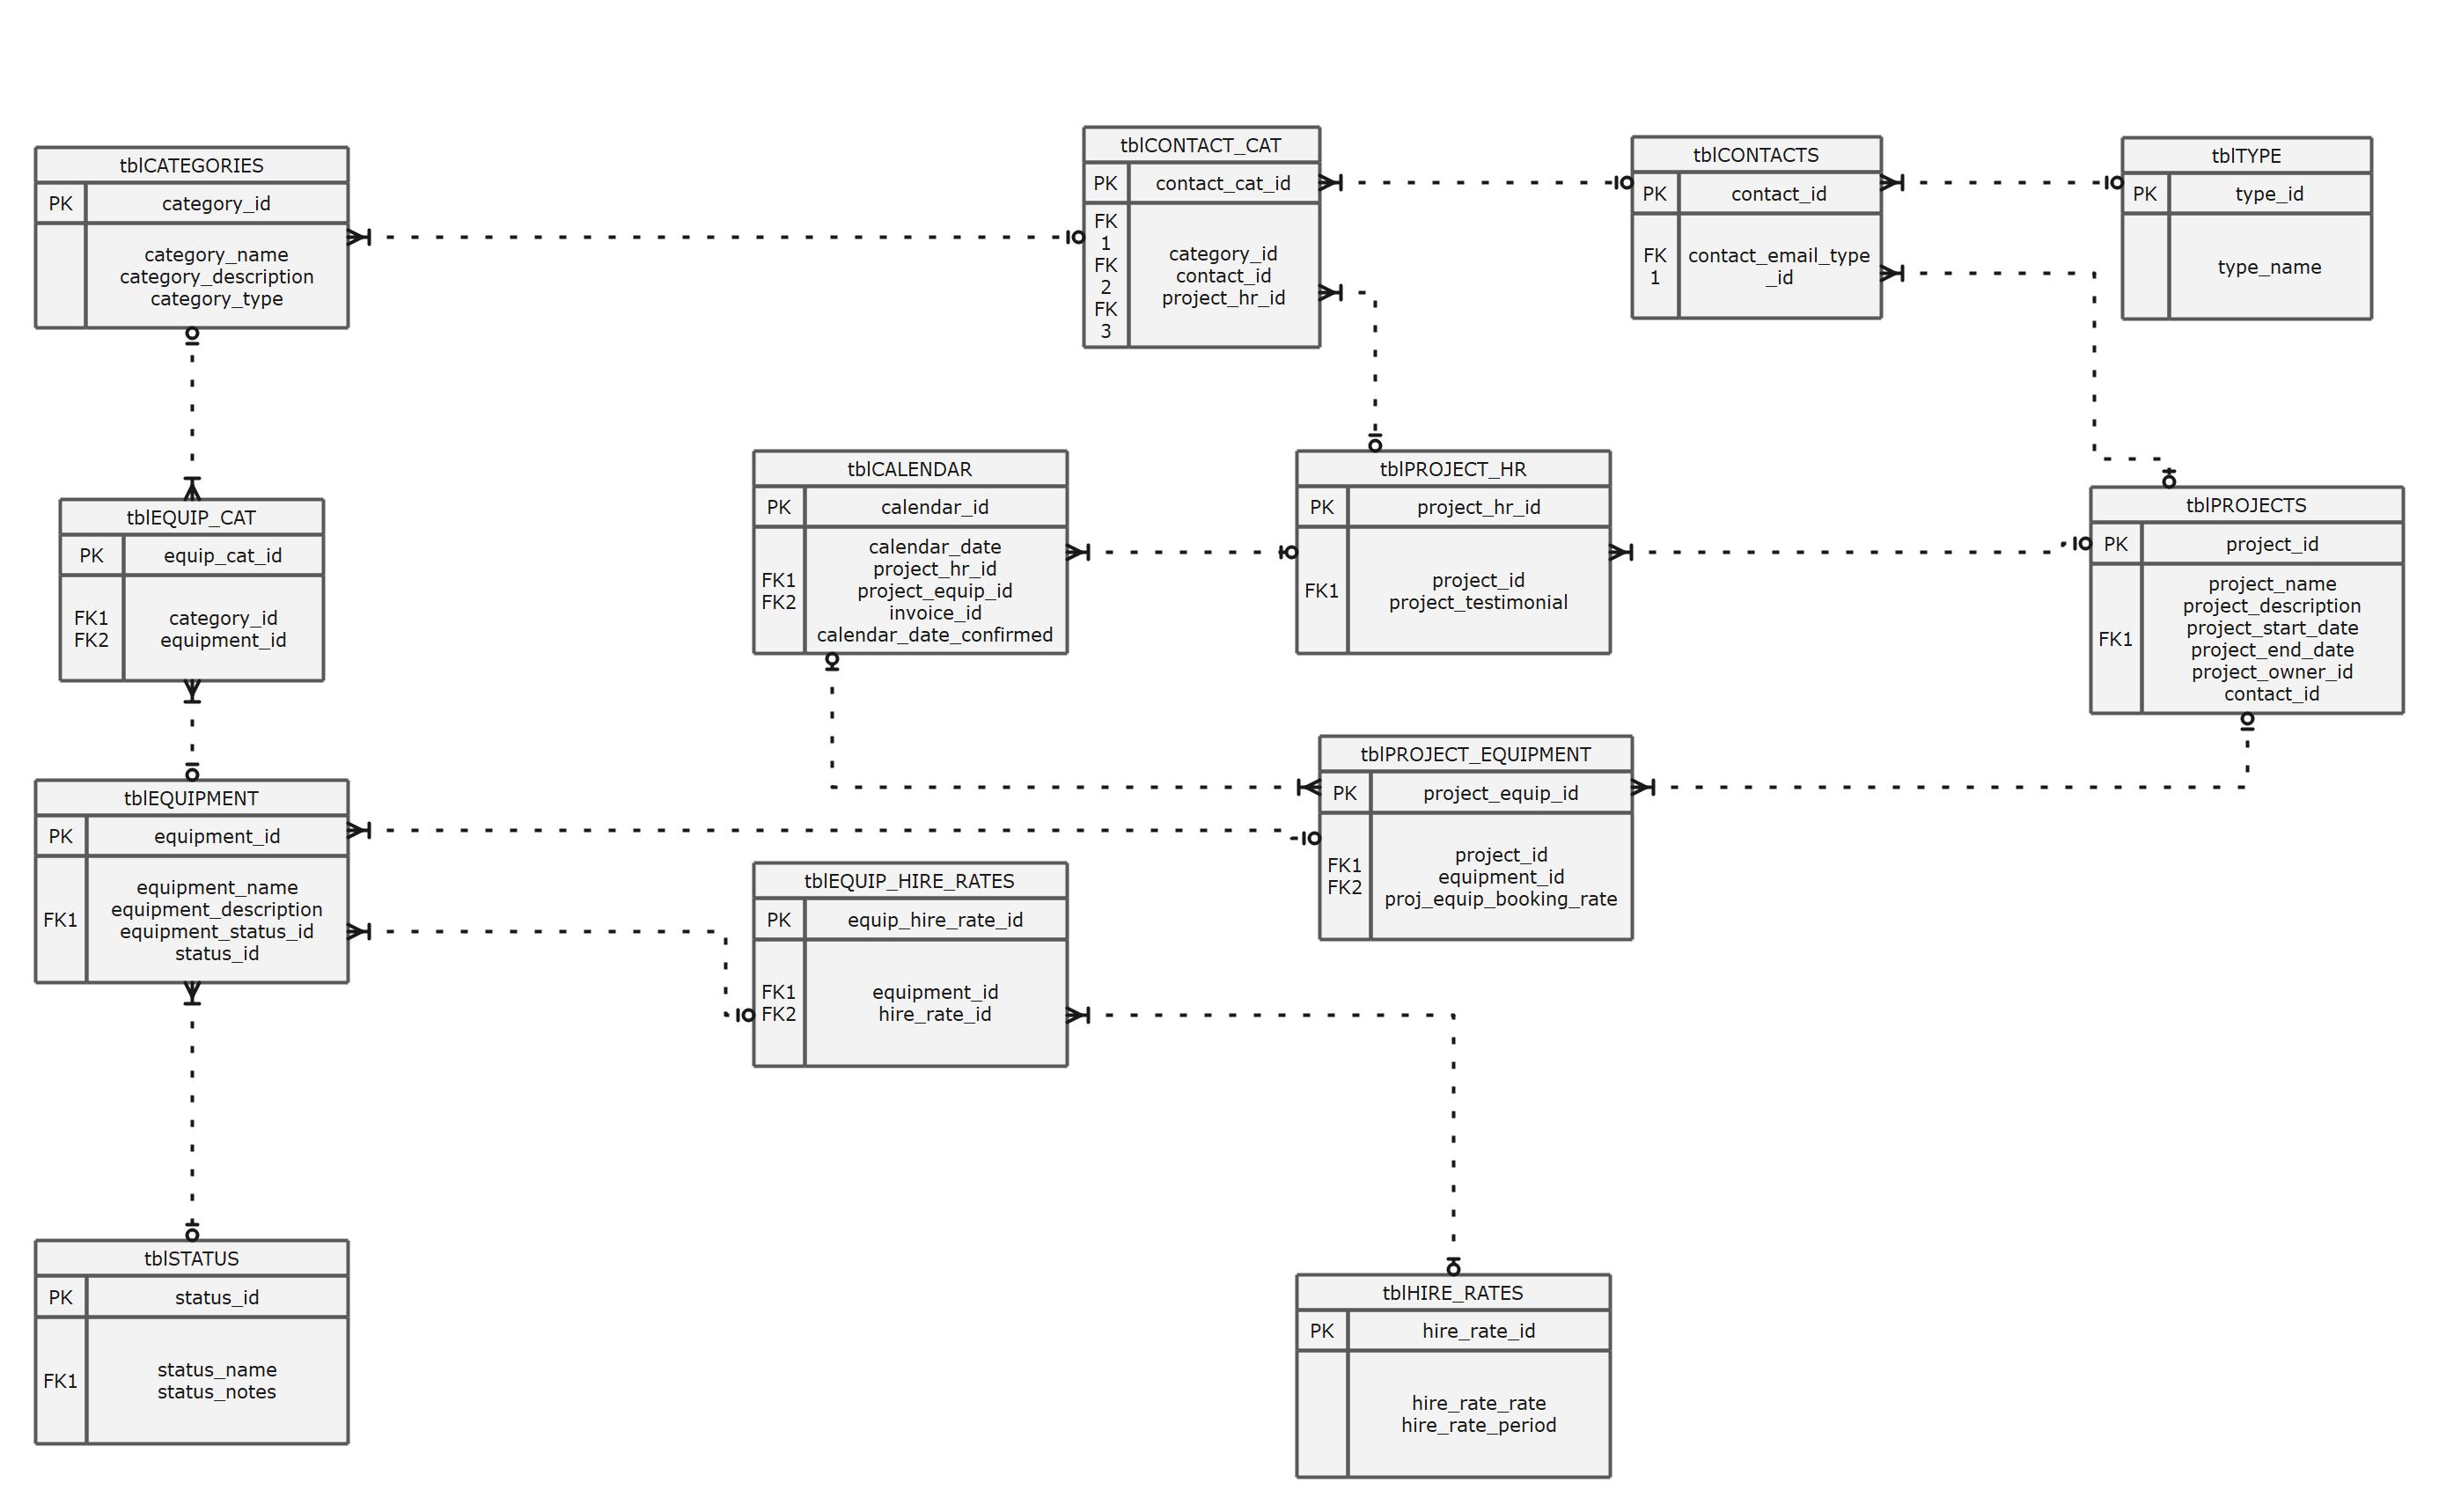 Standard Entity Relationship Diagram